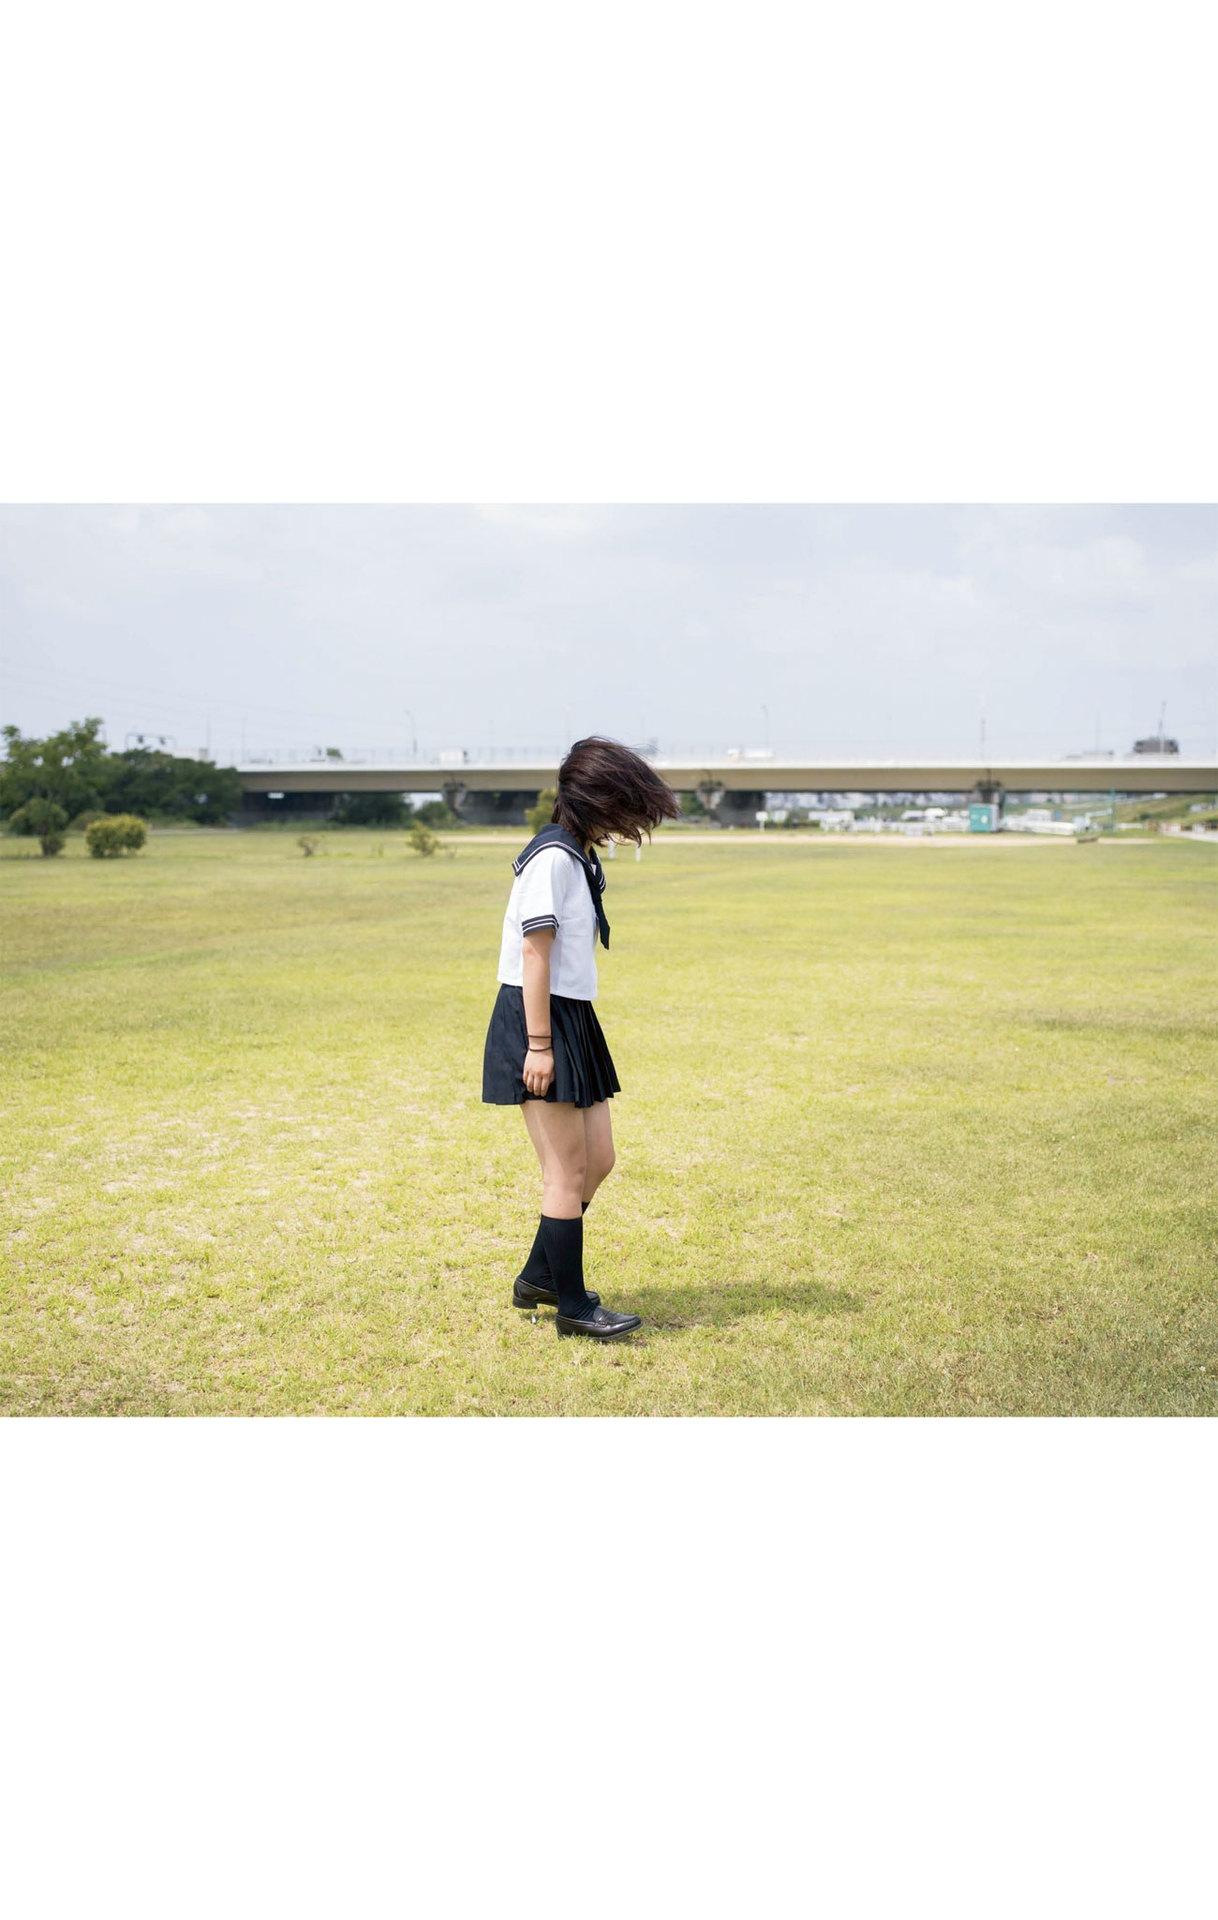 Summer Vacation Uniform After School Youth Bikini044